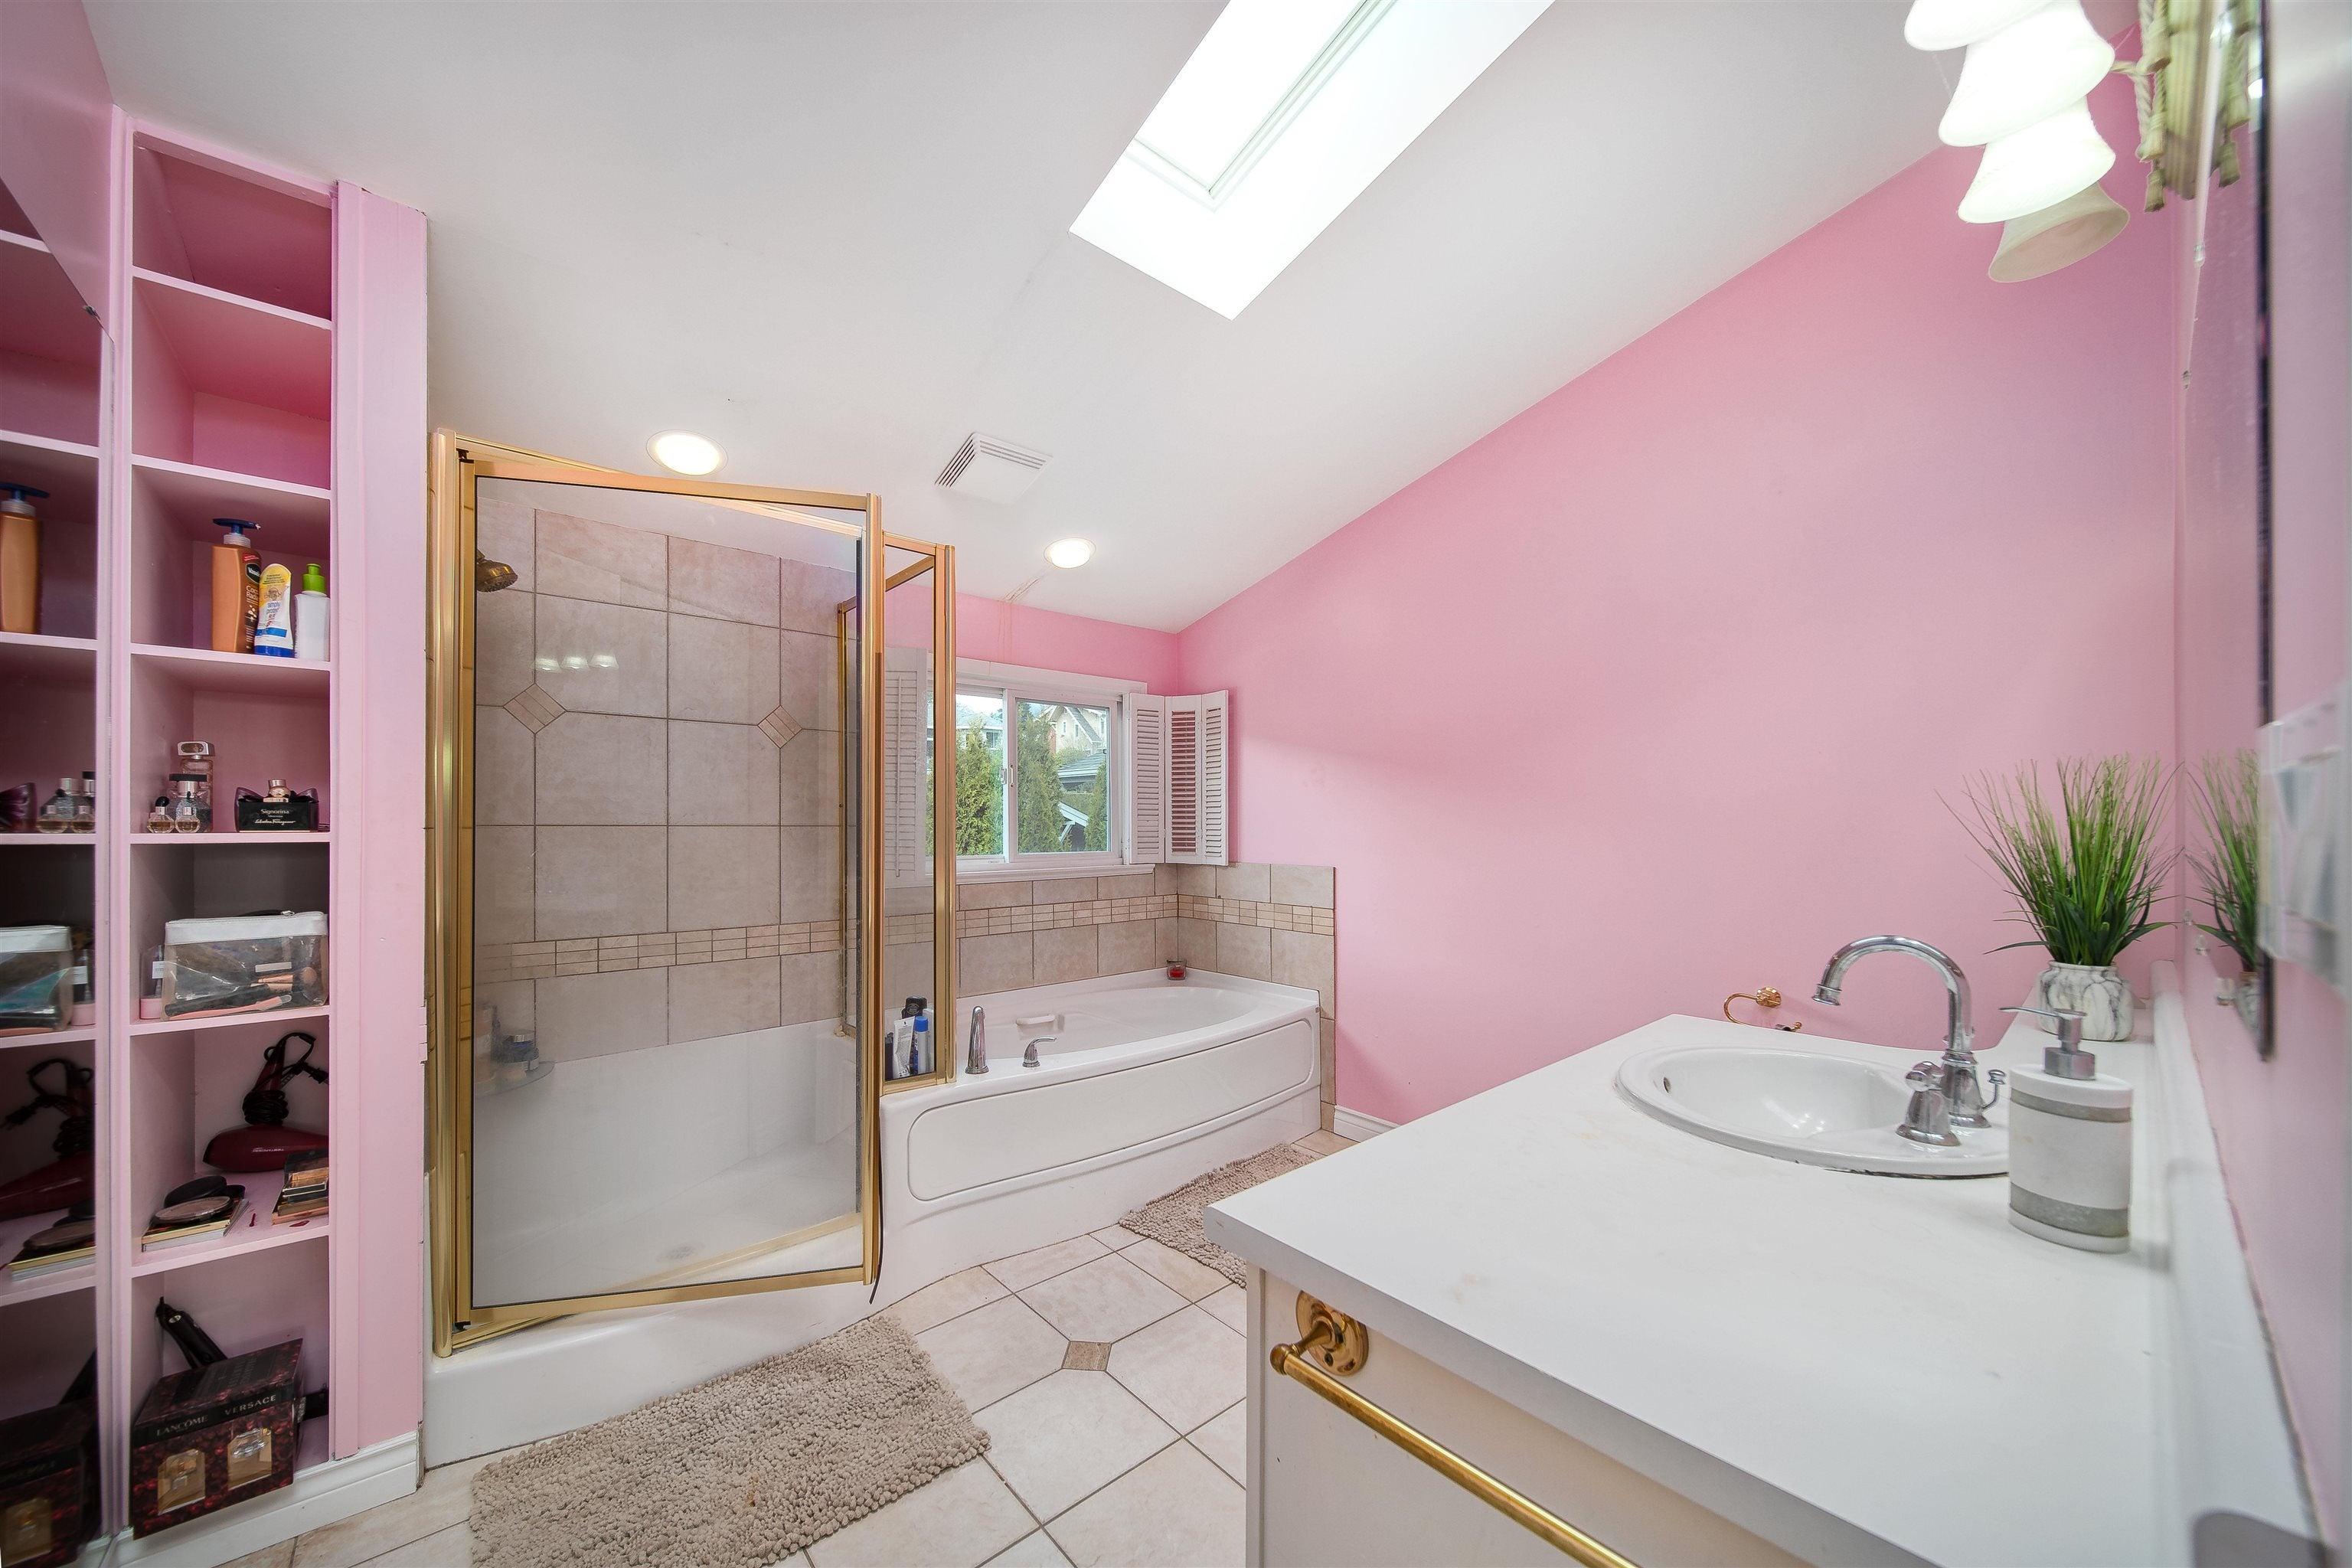 1357 FULTON AVENUE - Ambleside House/Single Family for sale, 6 Bedrooms (R2617731) - #23